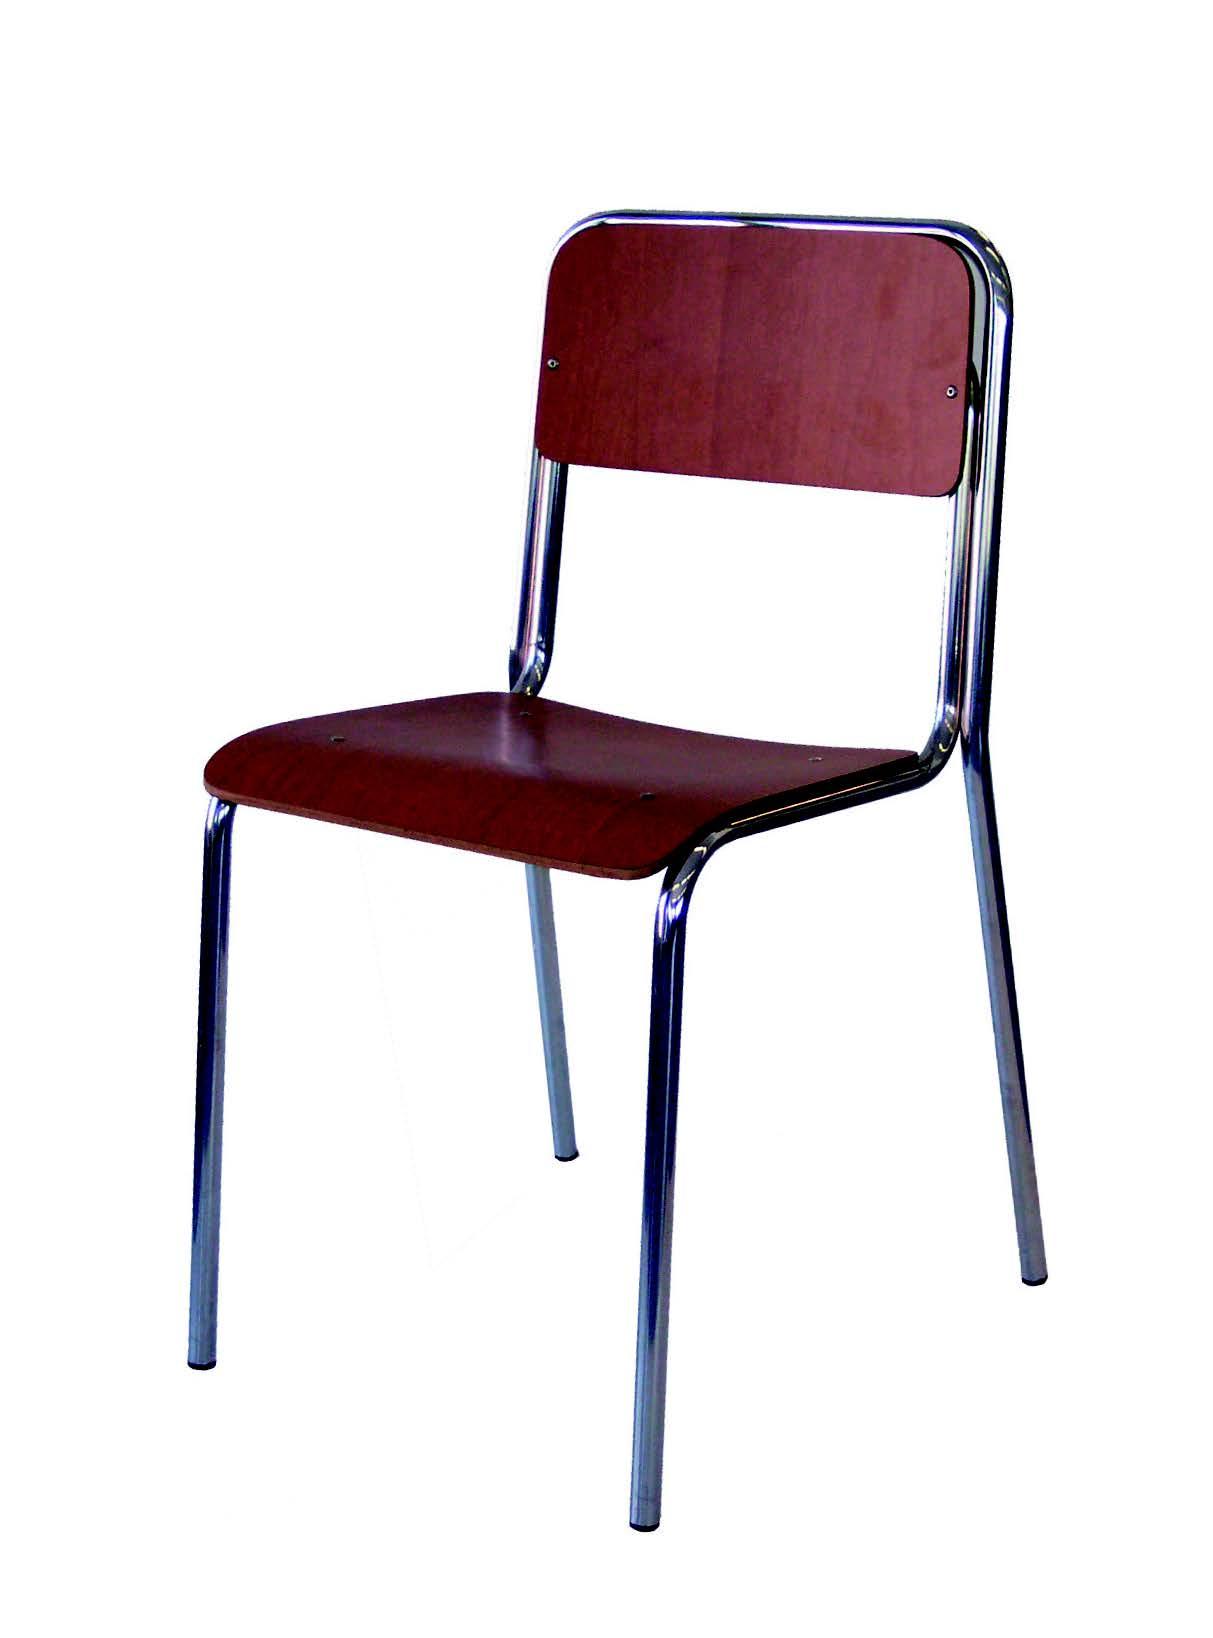 328 sedia impilabile rossana galimberti sedie e tavoli for Galimberti sedie